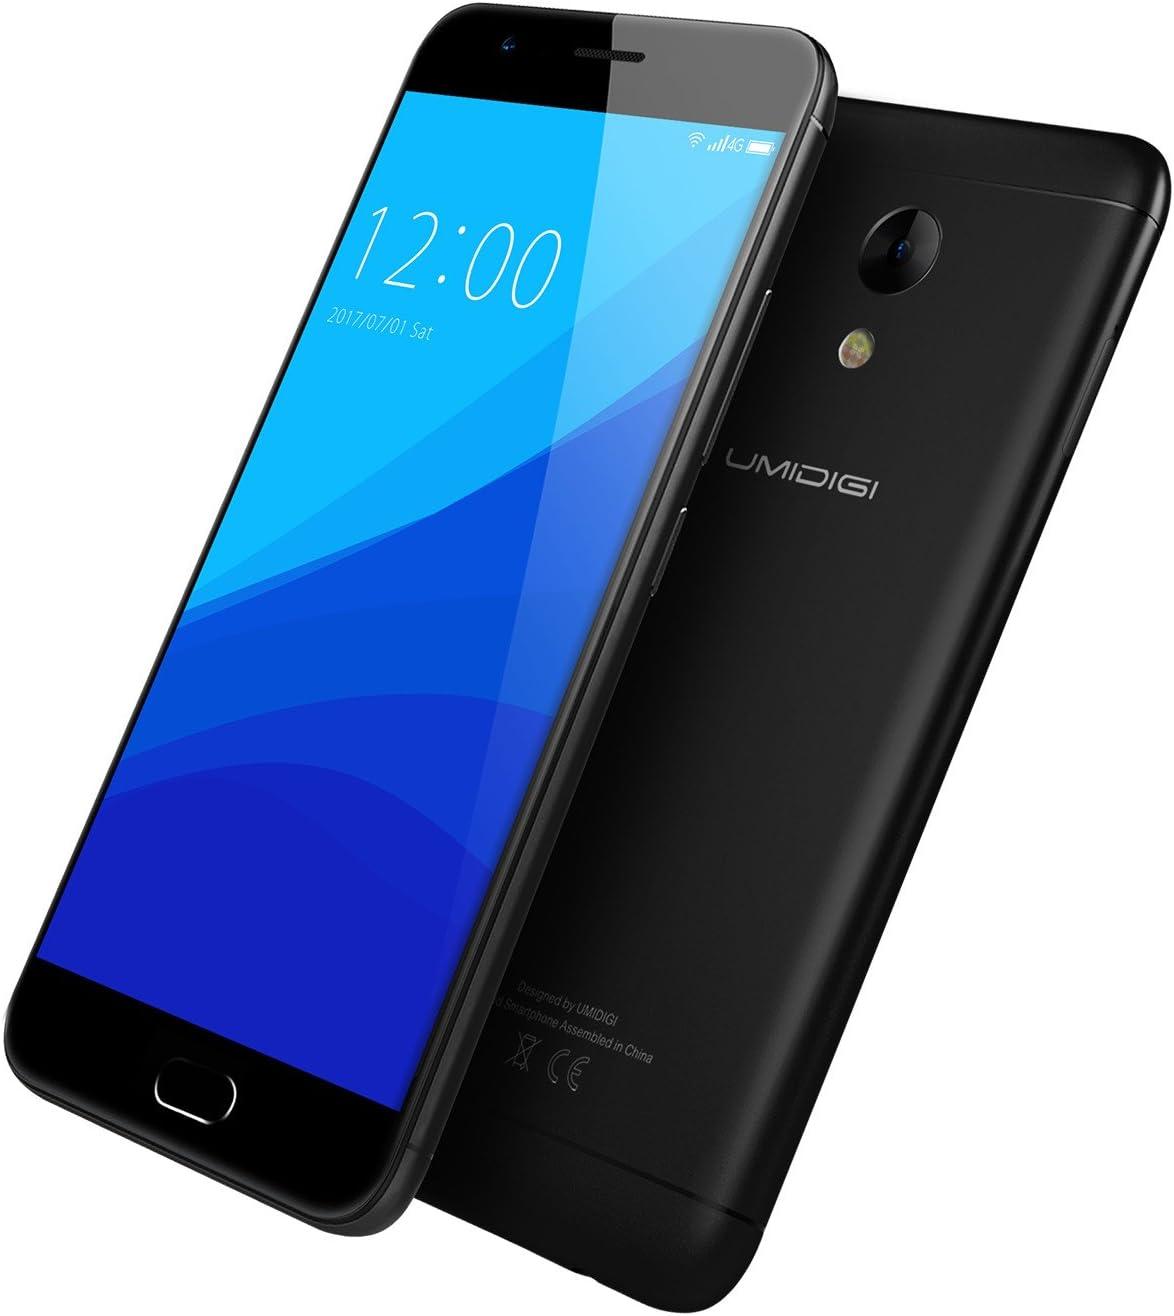 Smartphone Libre,UMIDIGI C2 telefonos moviles libres-5 Pulgadas con Pantalla HD-Procesador Octa-Core 1.5GHz MTK6750T-Dual Cámara 5MP+13MP--4GB RAM + 64GB ROM-Dual SIM 4G-4000mAh-Full Metal Design-UMI: Amazon.es: Electrónica